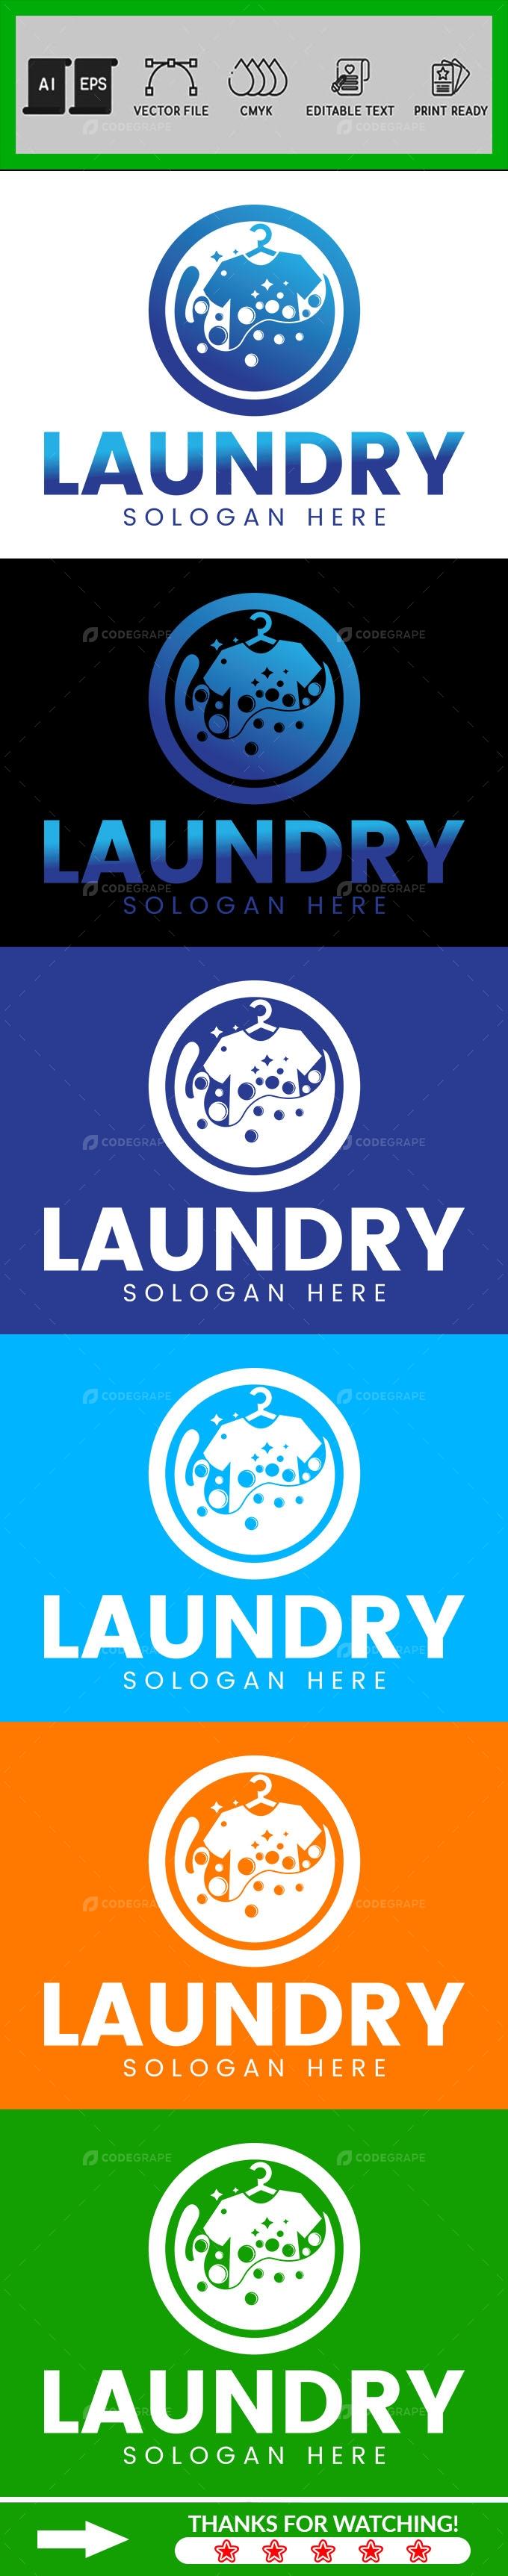 Laundry Logo Design Template